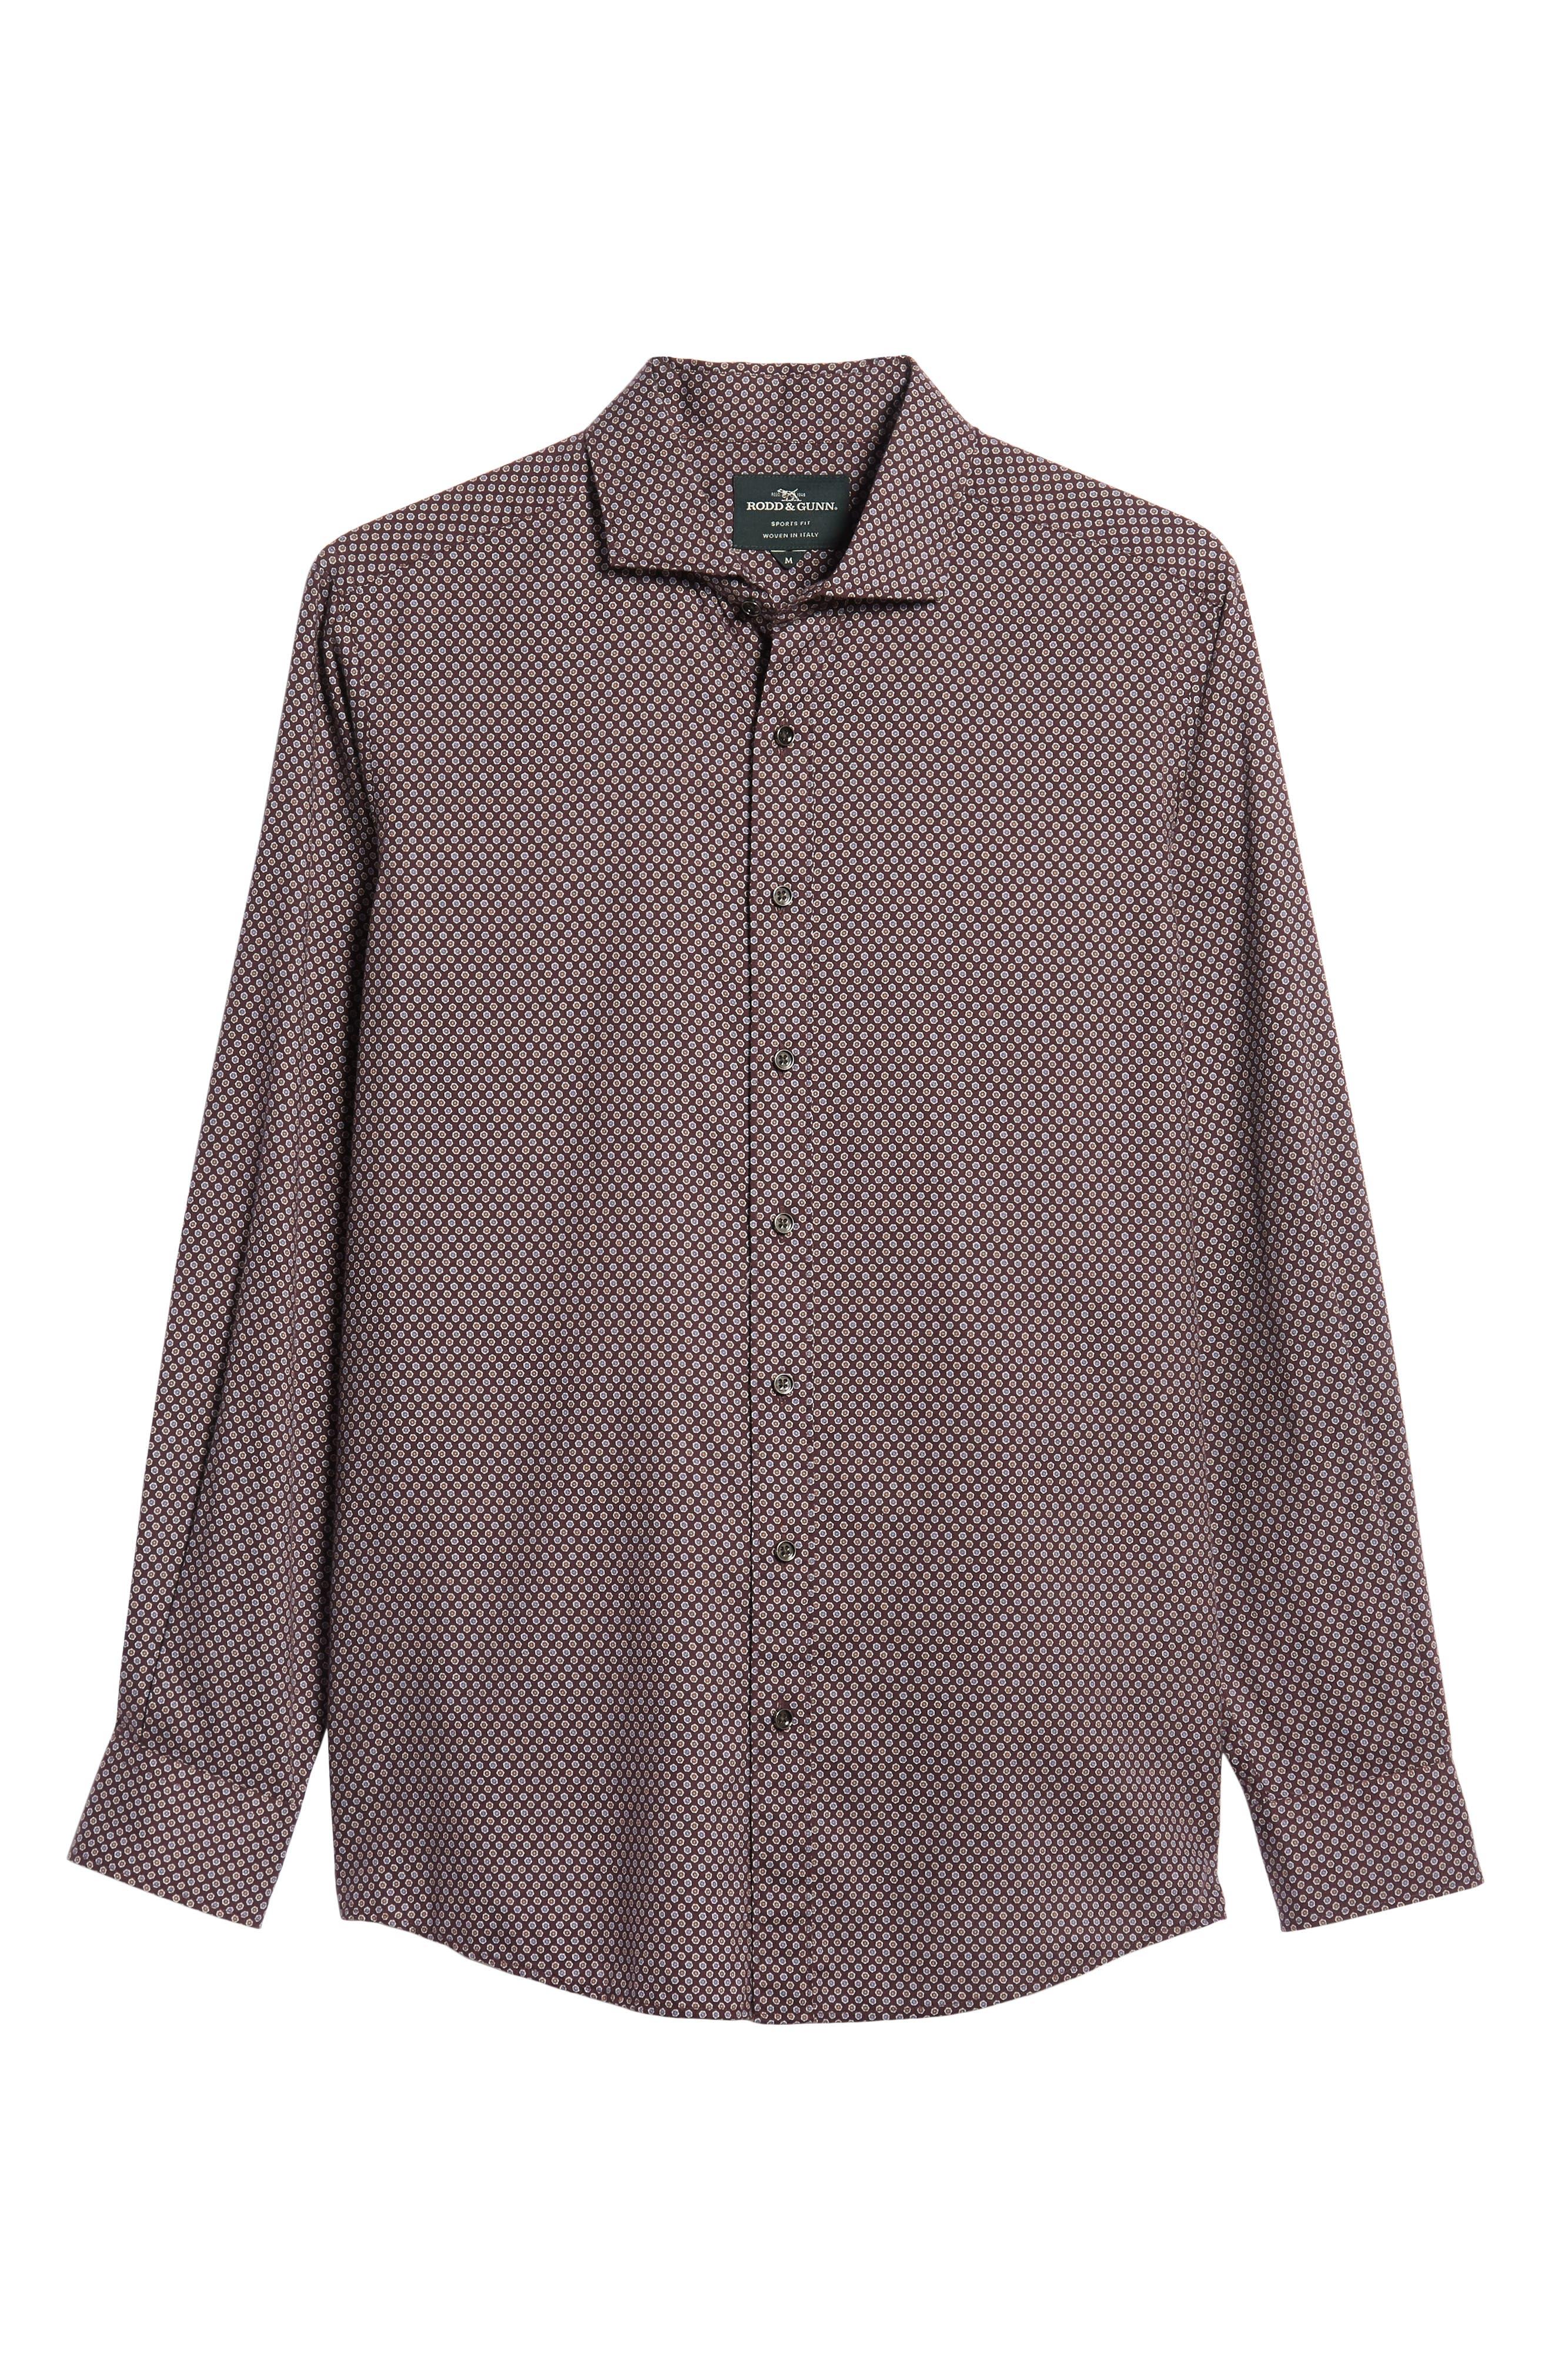 Marsden Bay Regular Fit Sport Shirt,                             Alternate thumbnail 5, color,                             BORDEAUX